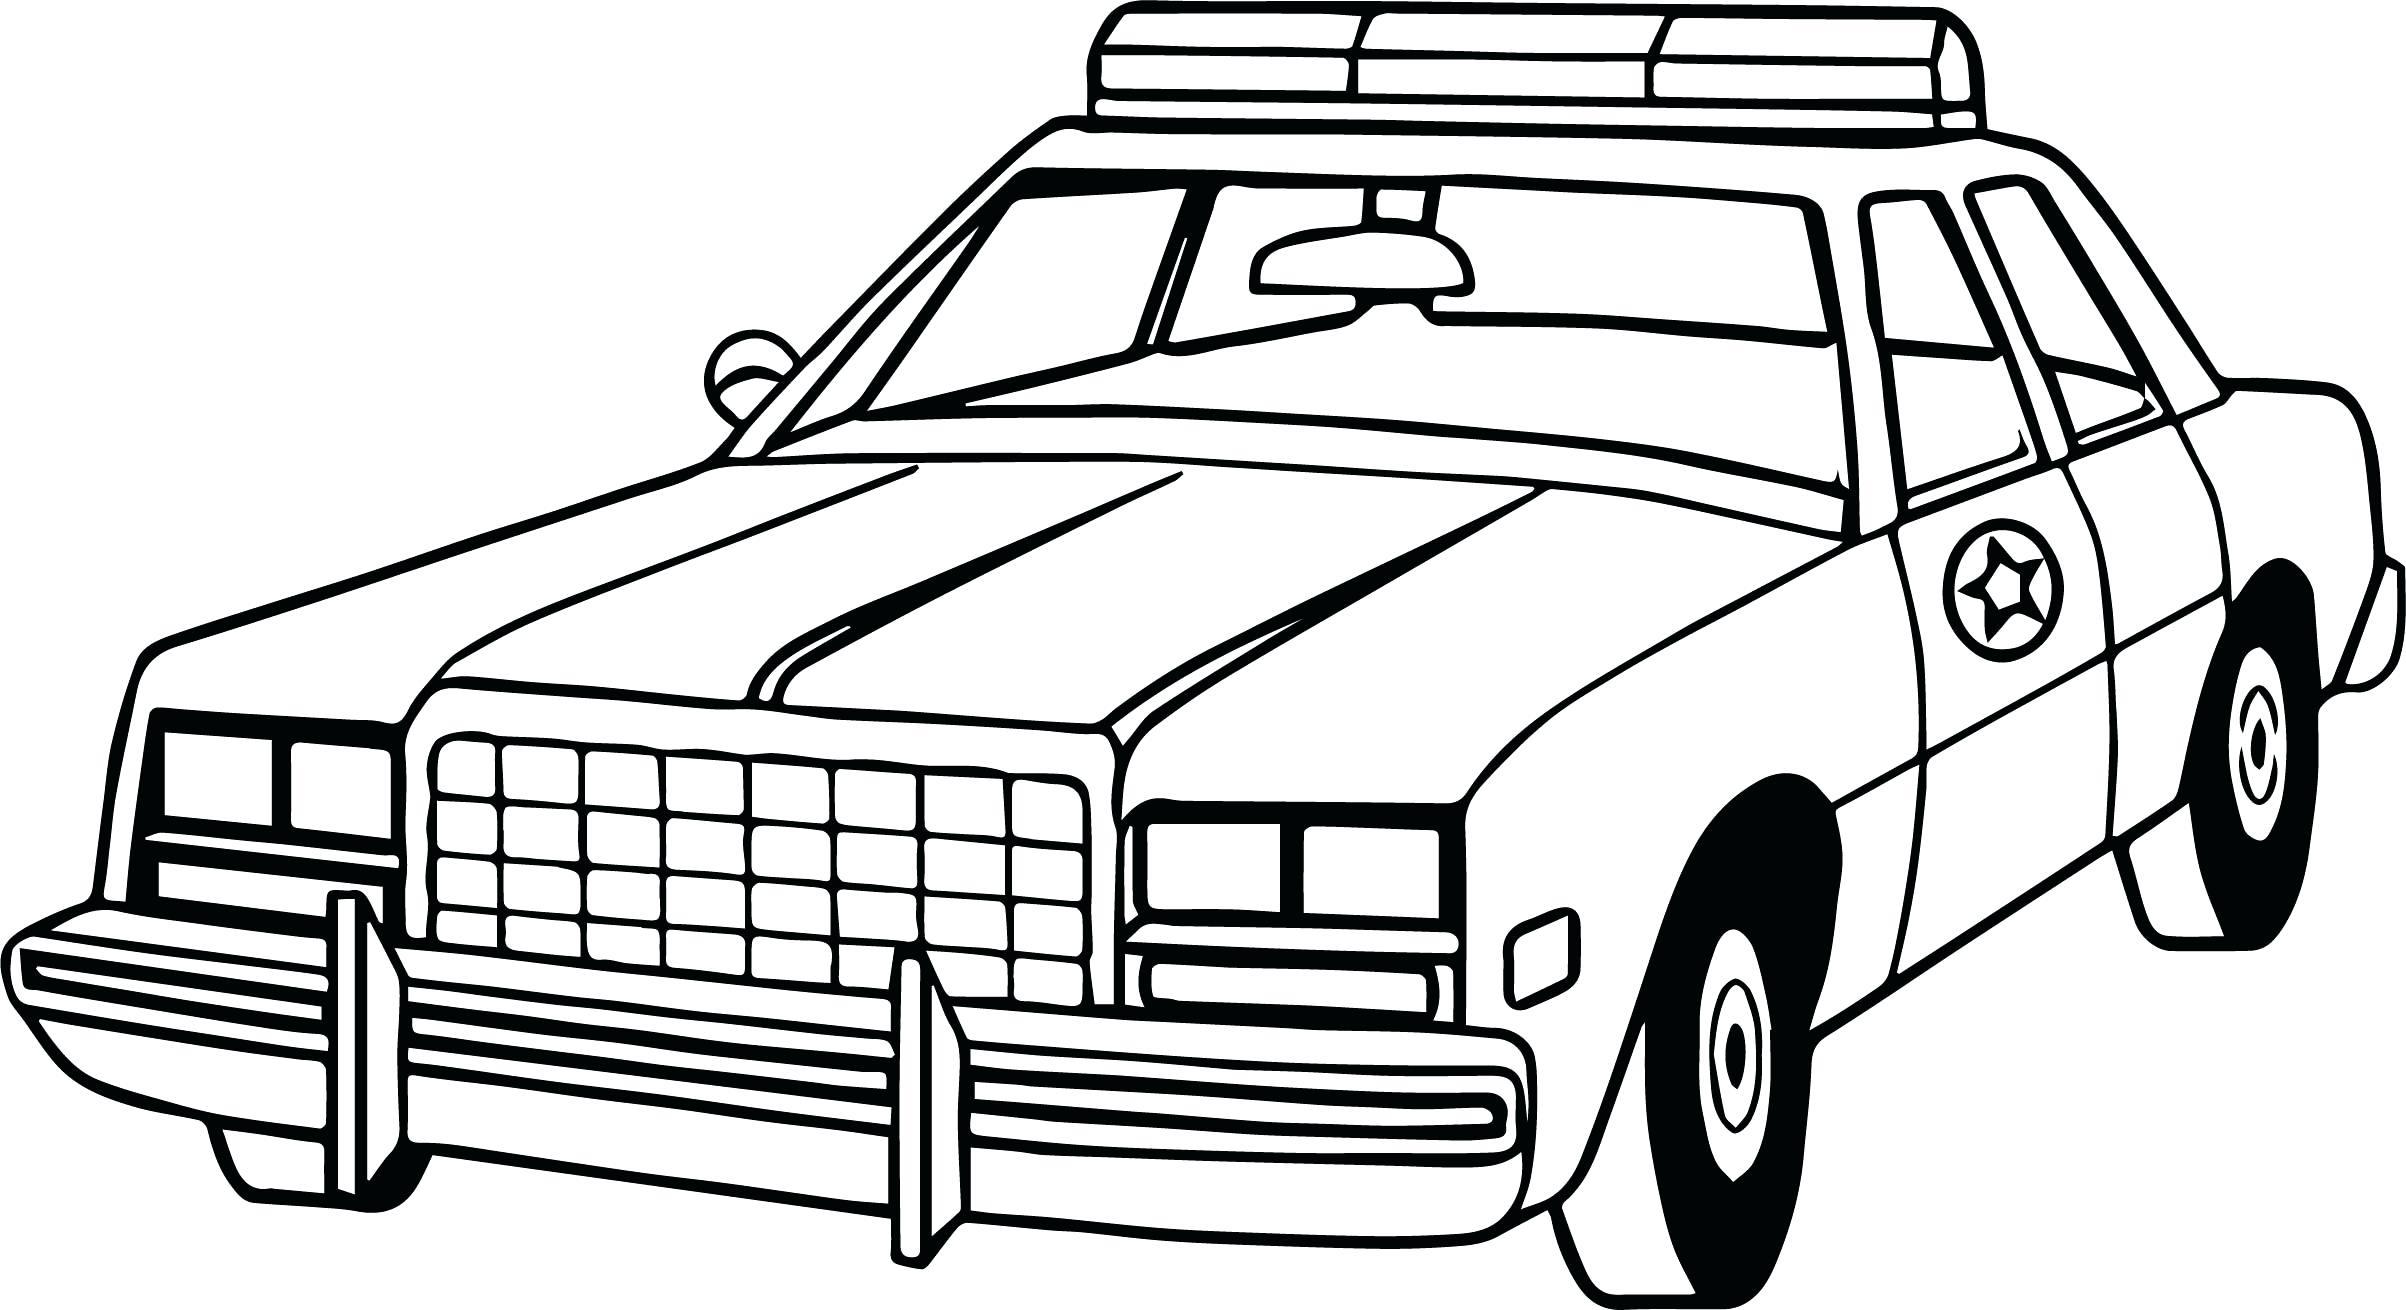 New Car Drawing at GetDrawings | Free download